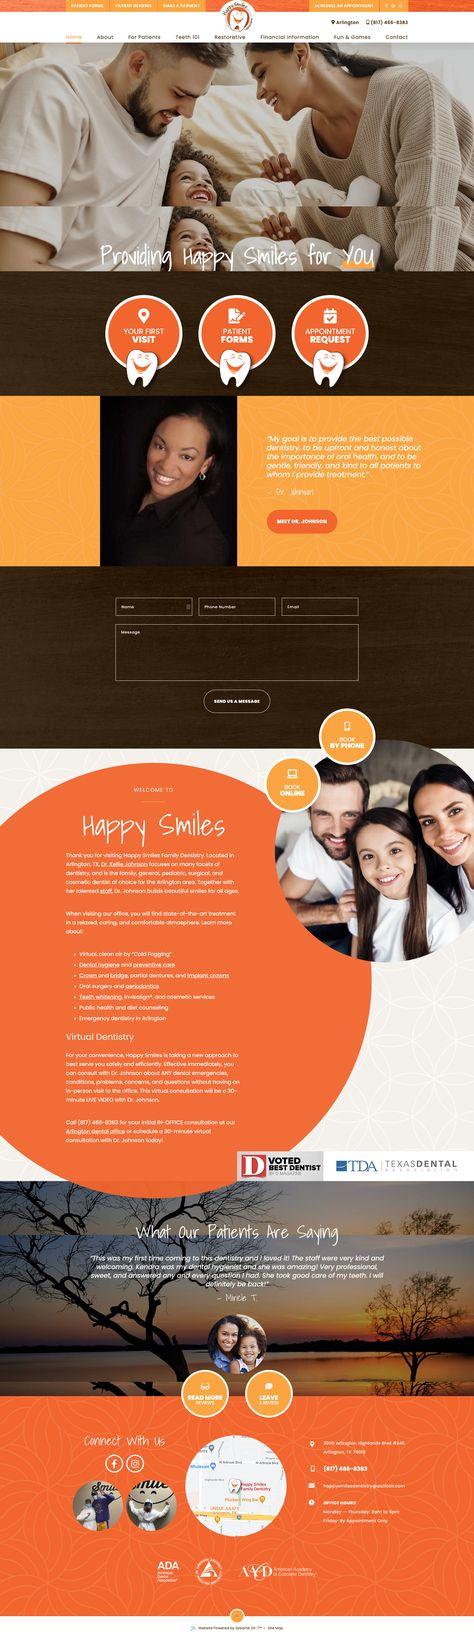 Happy Smiles Family Dentistry